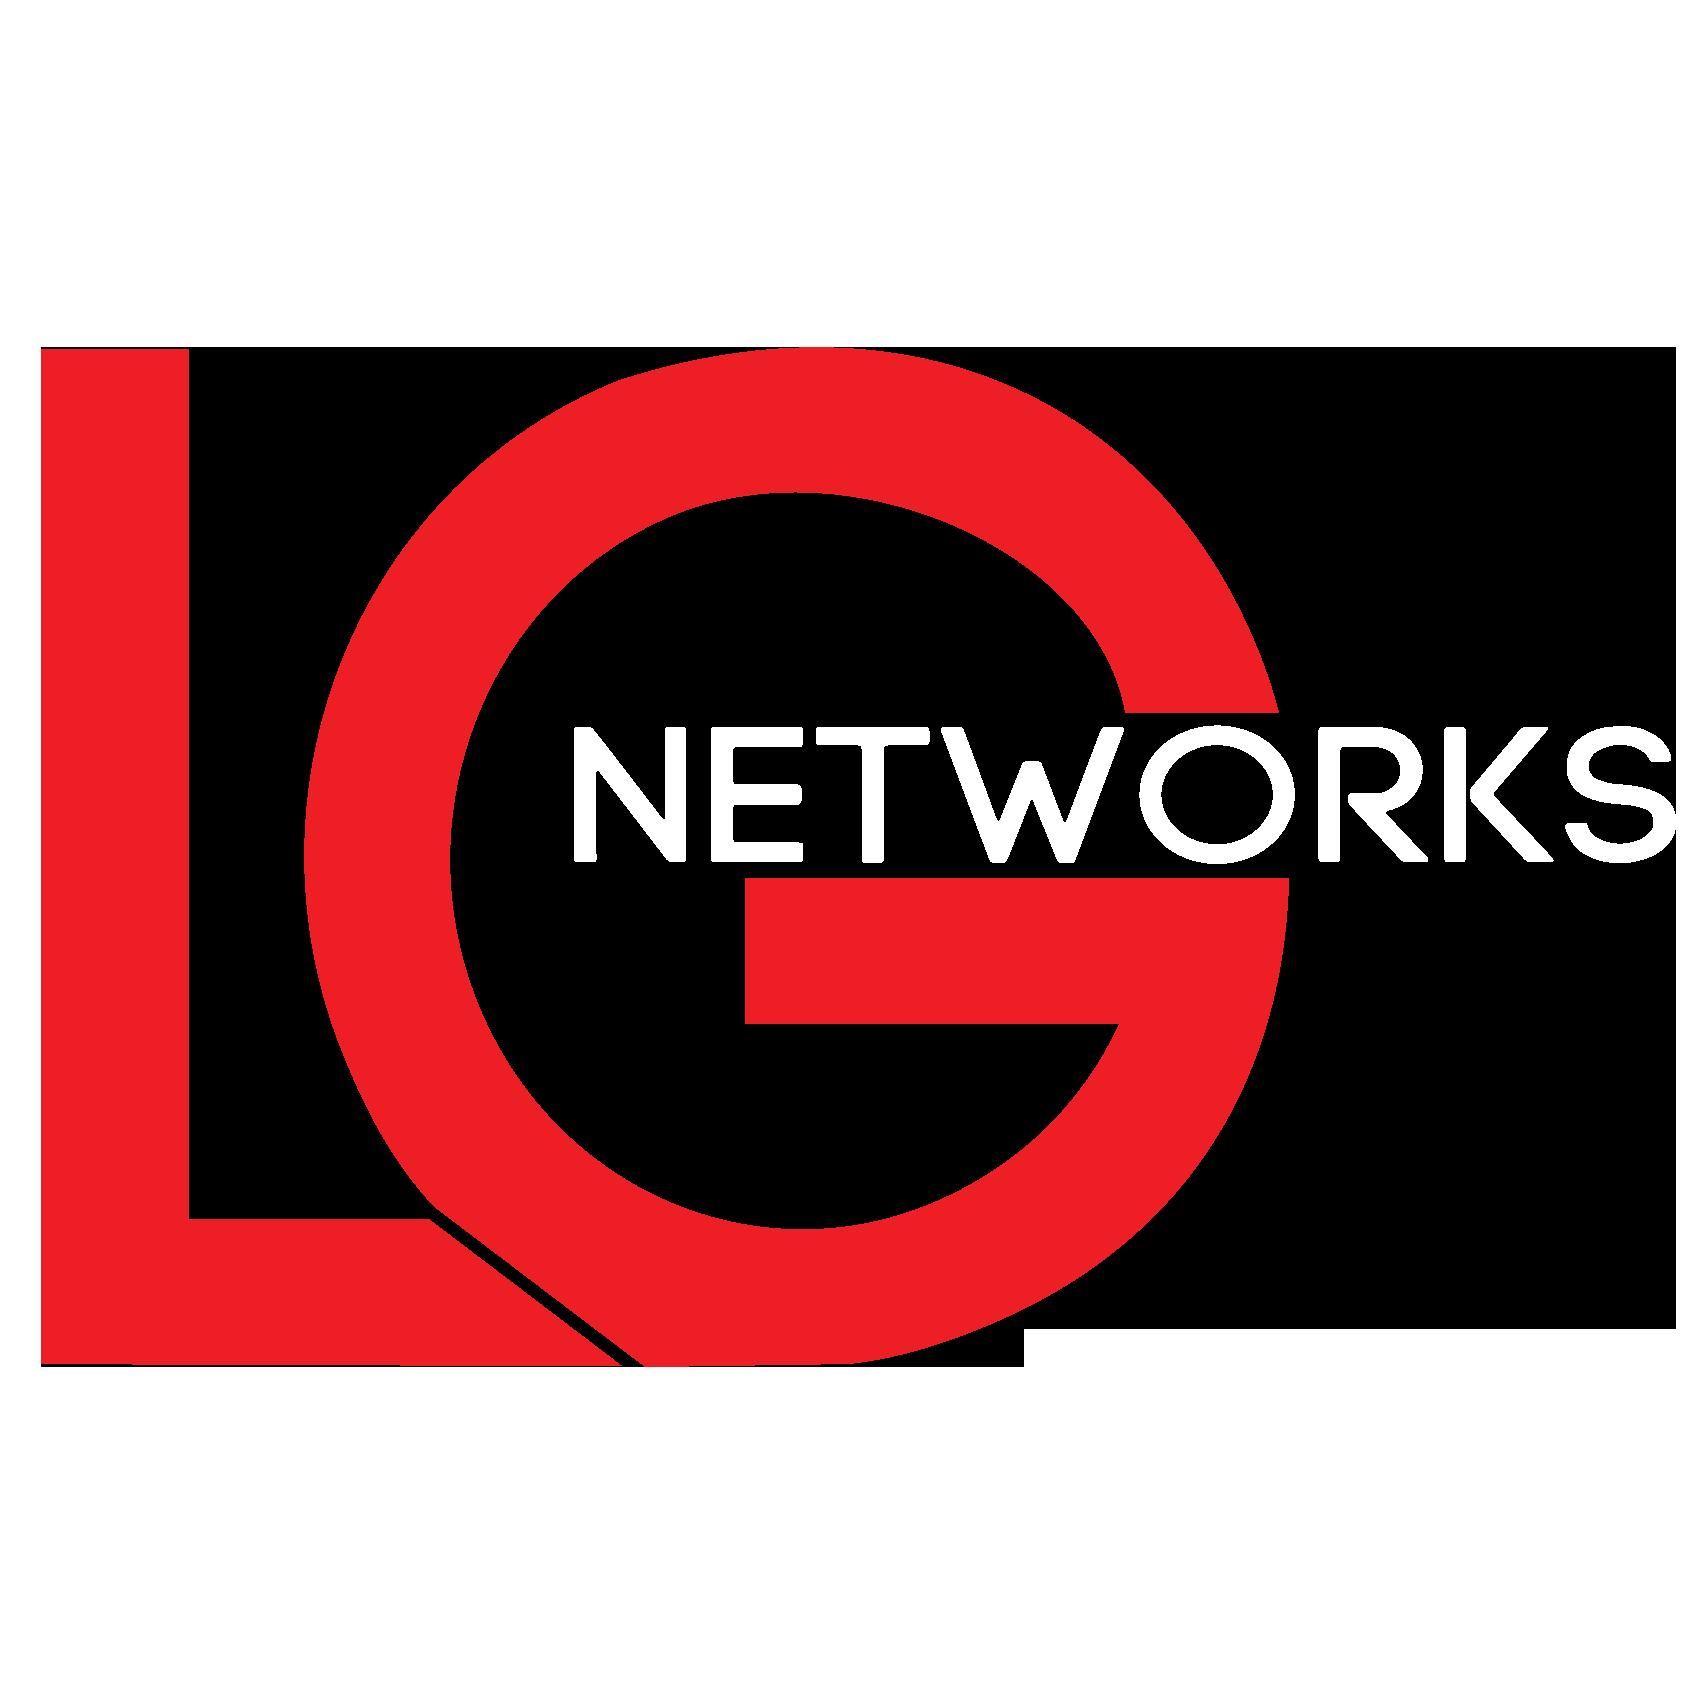 LG Networks Logo White